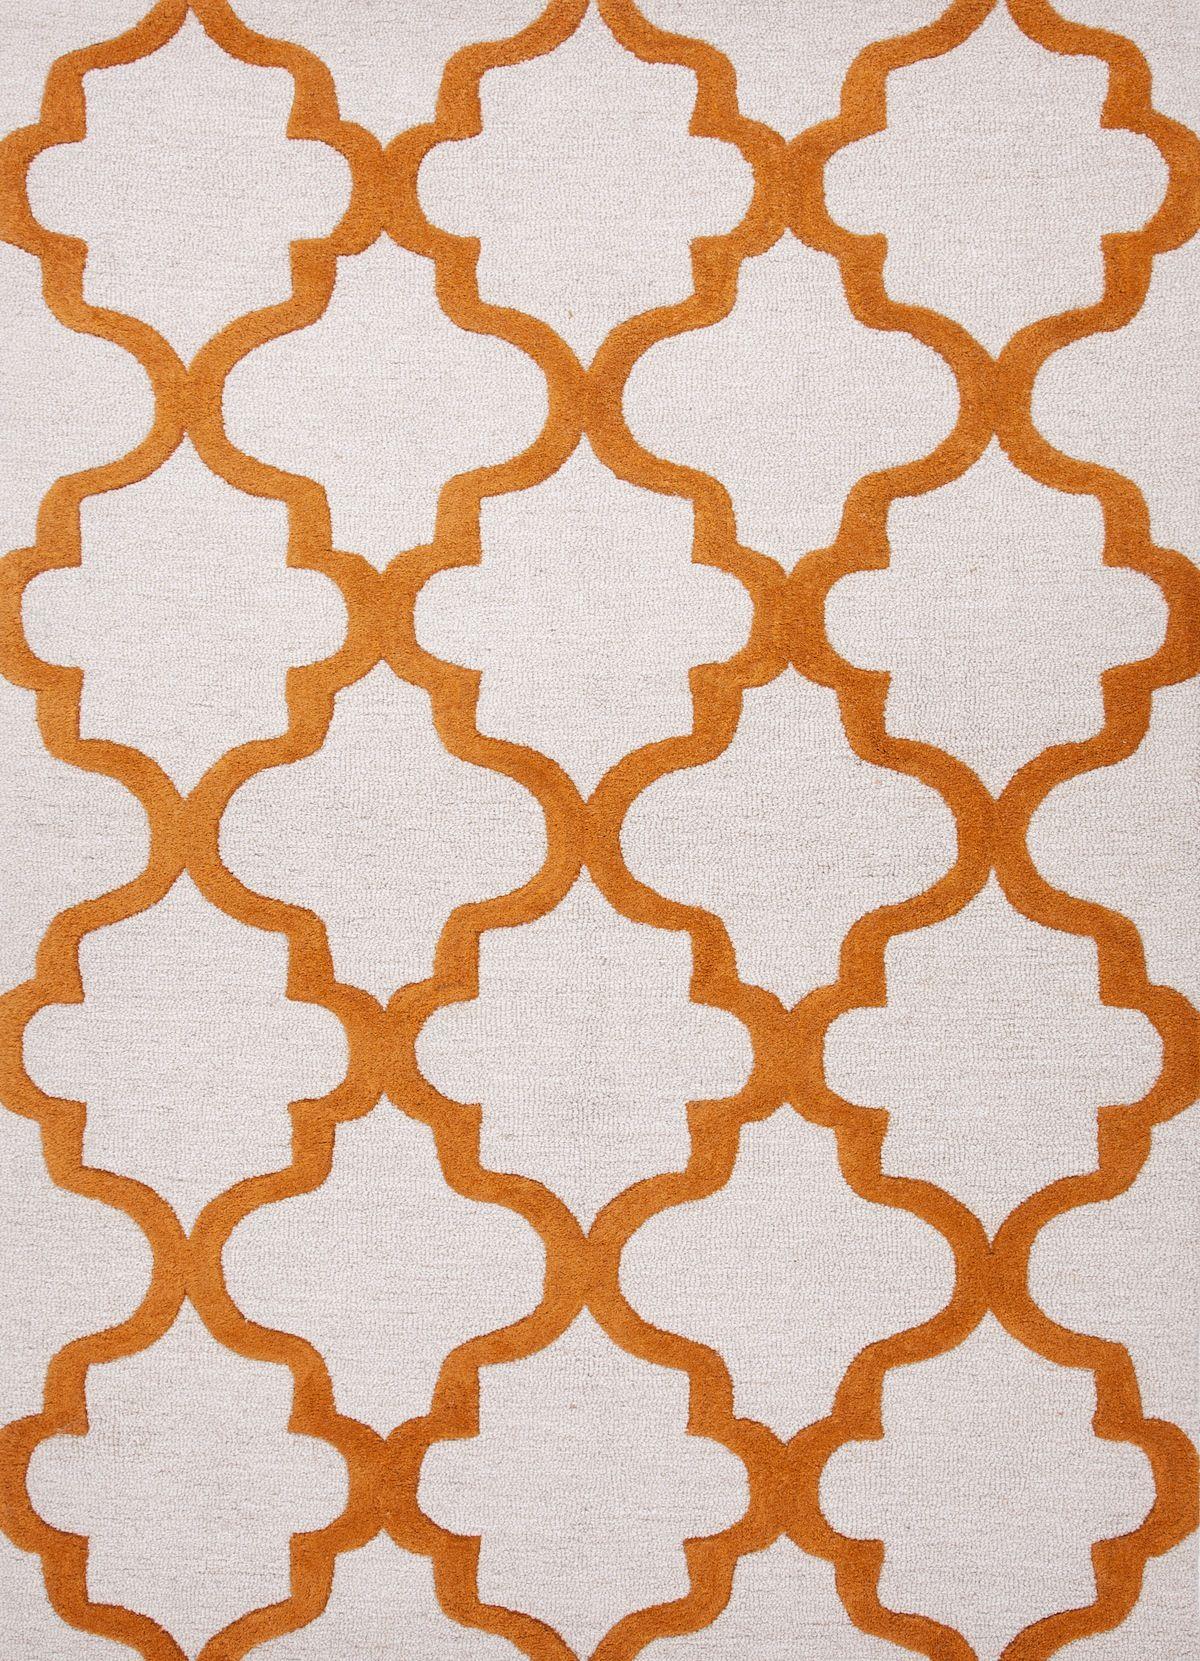 orange white rug  roselawnlutheran - orange white nursery area rug